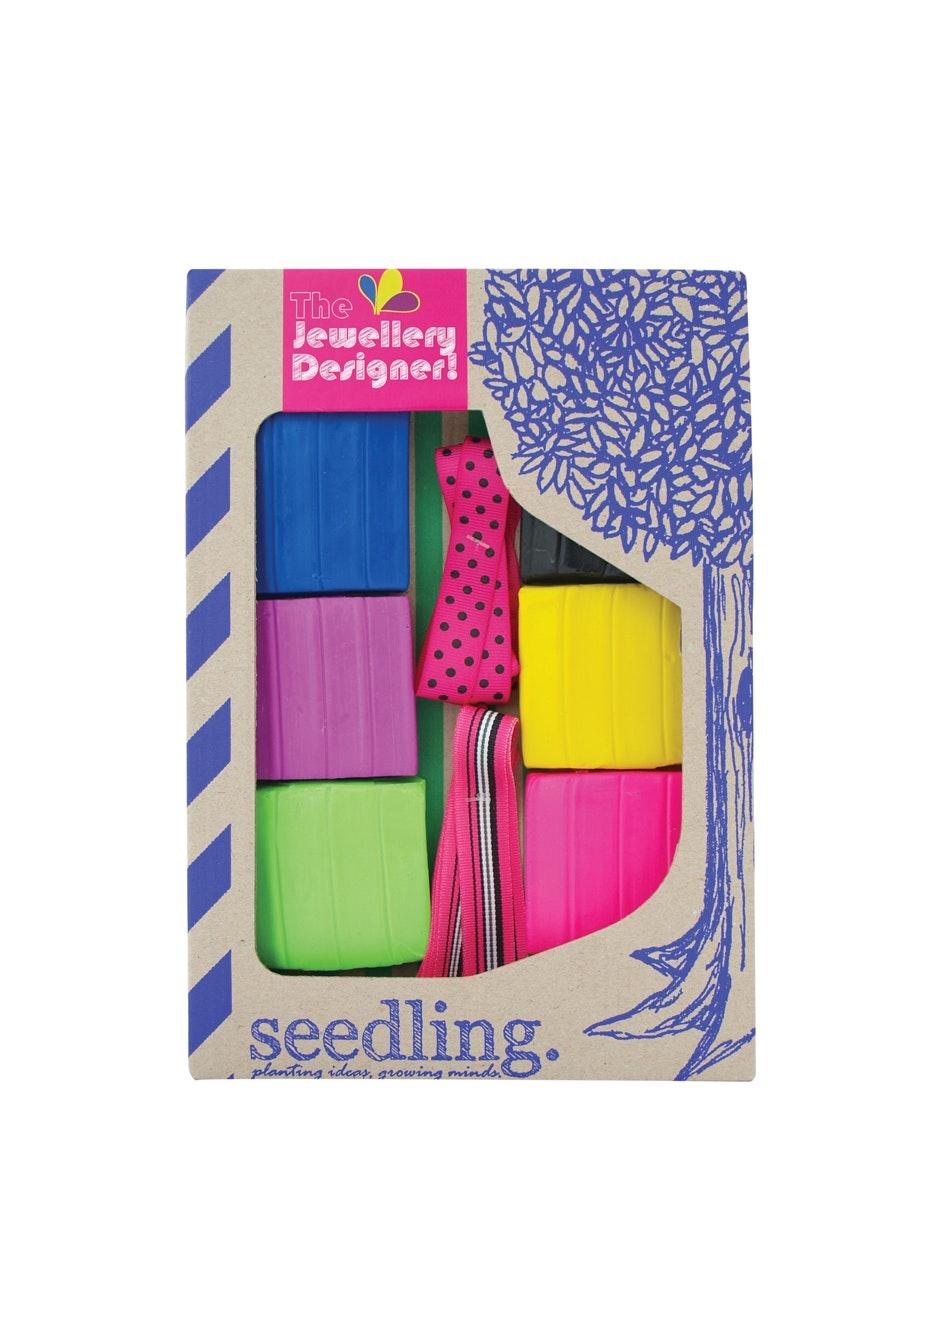 Seedling - The Jewellery Designer